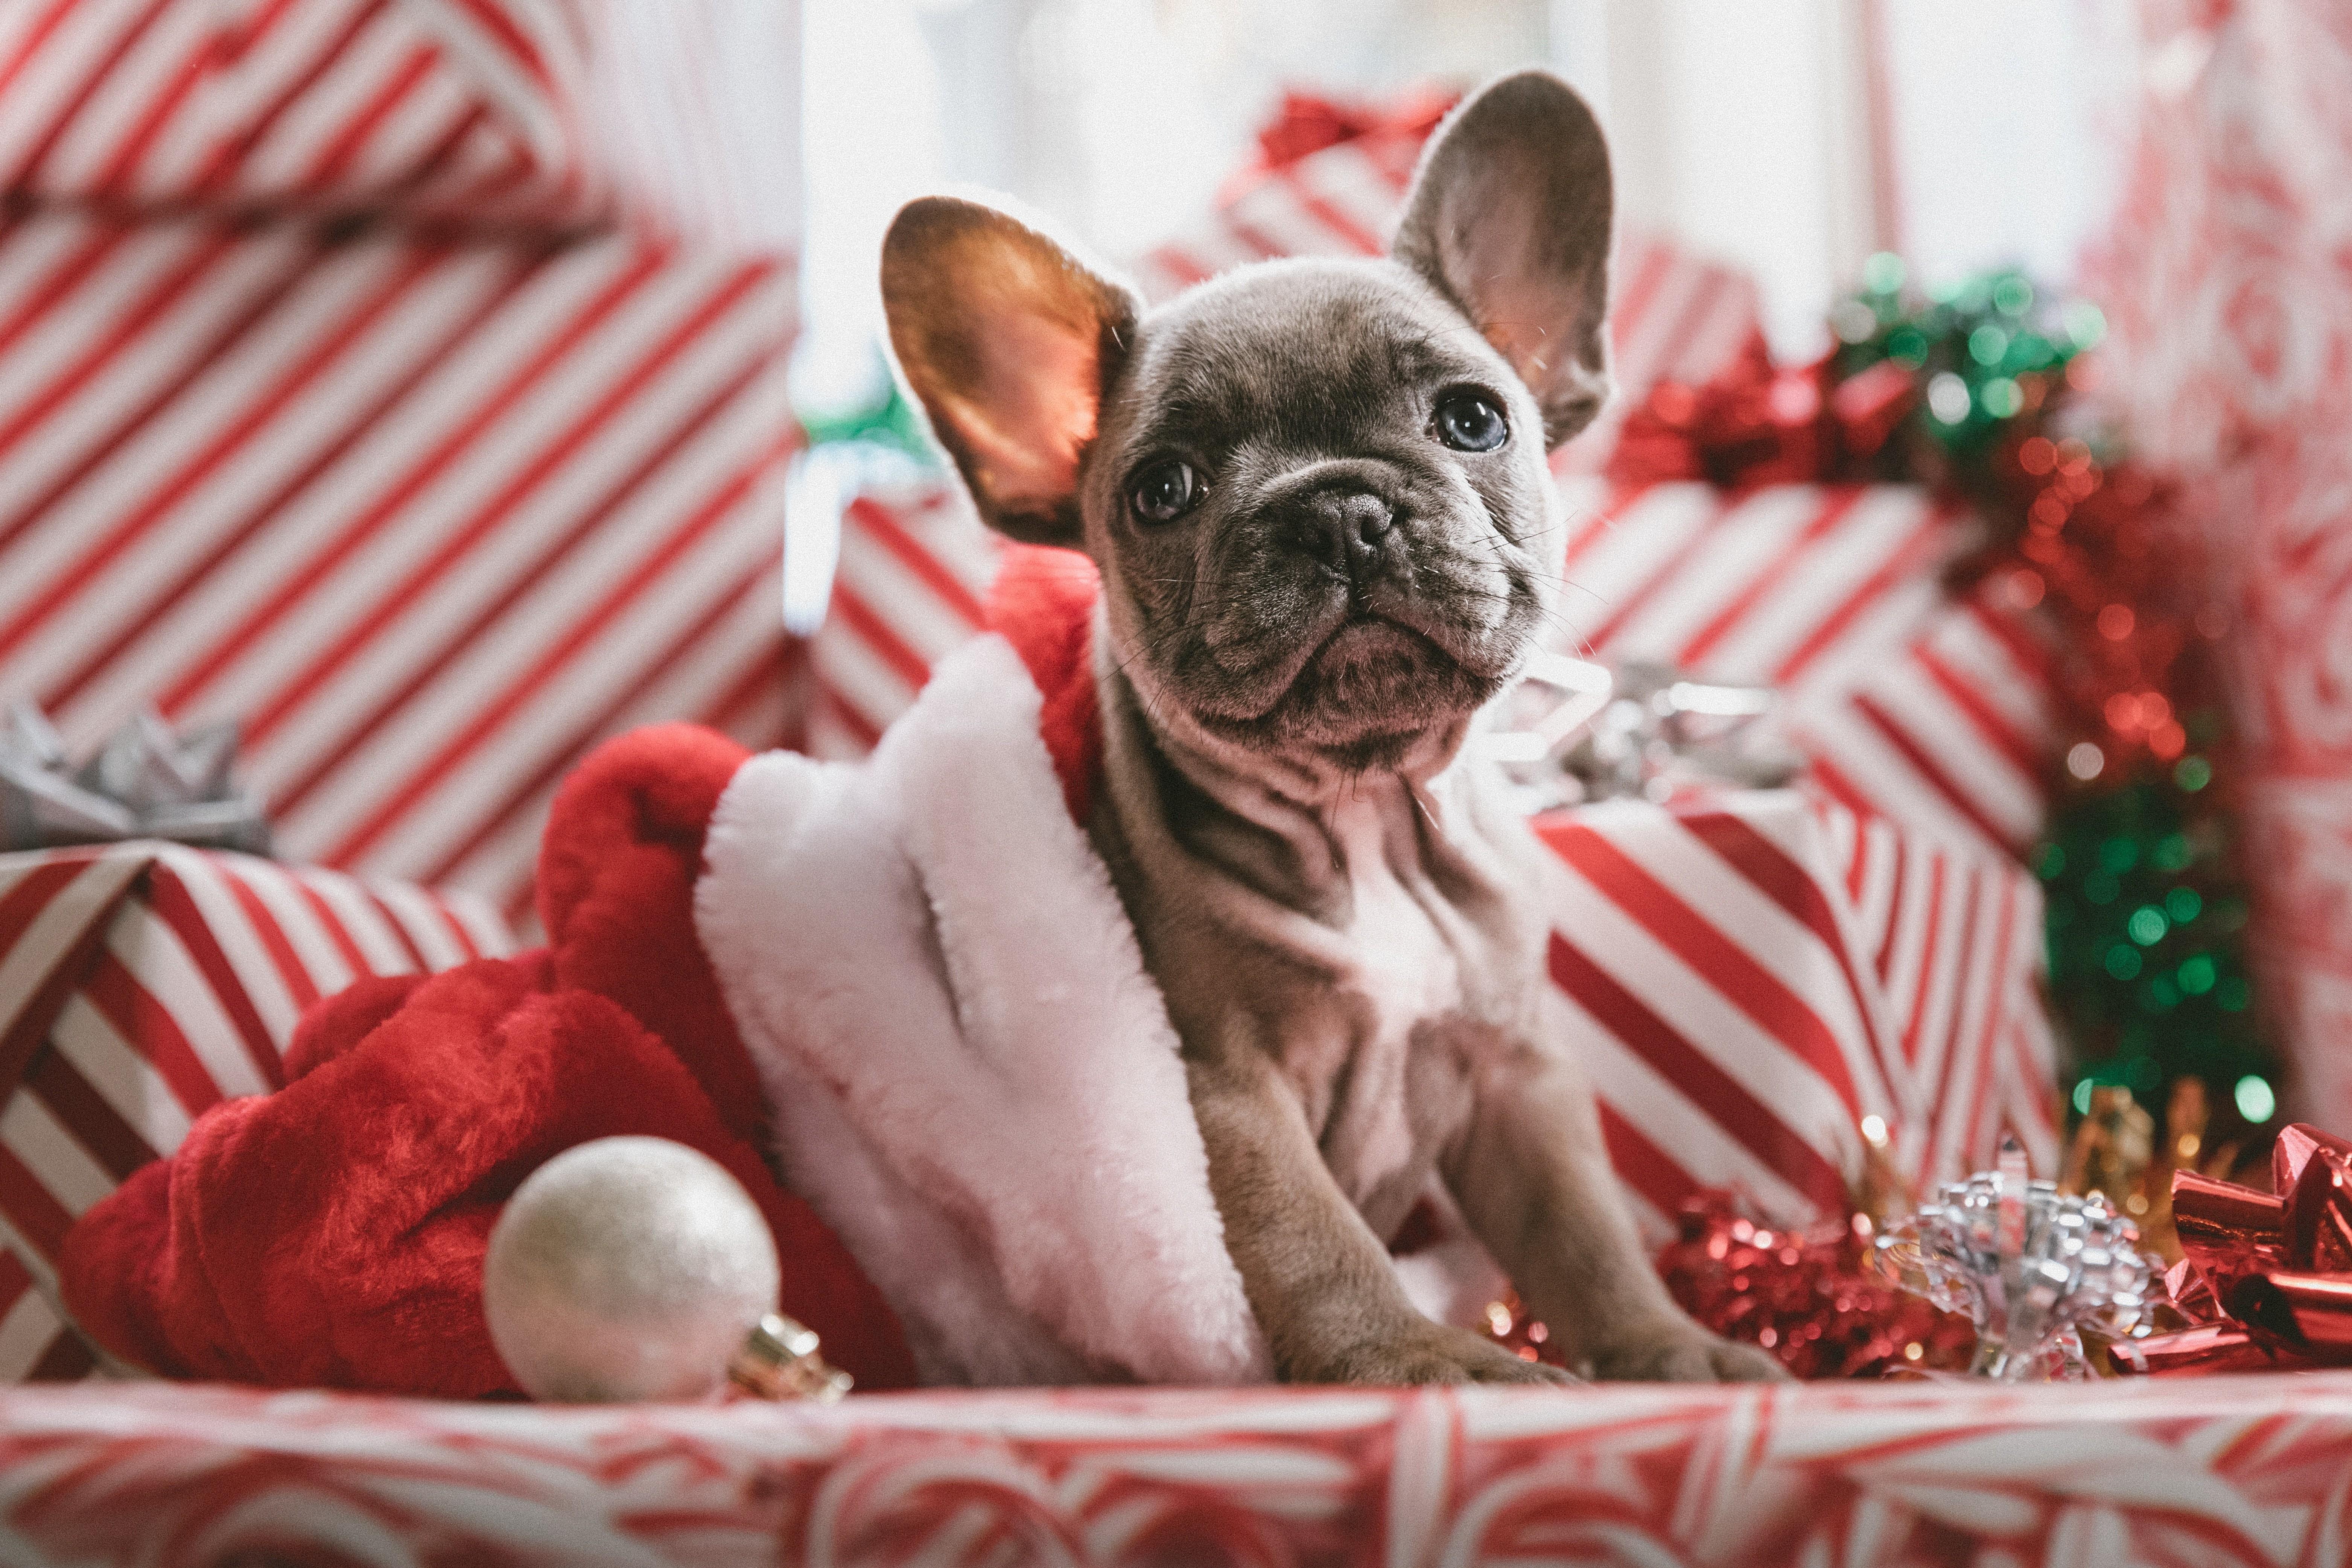 Wallpaper Christmas New Year Puppy Cute Animals 5k